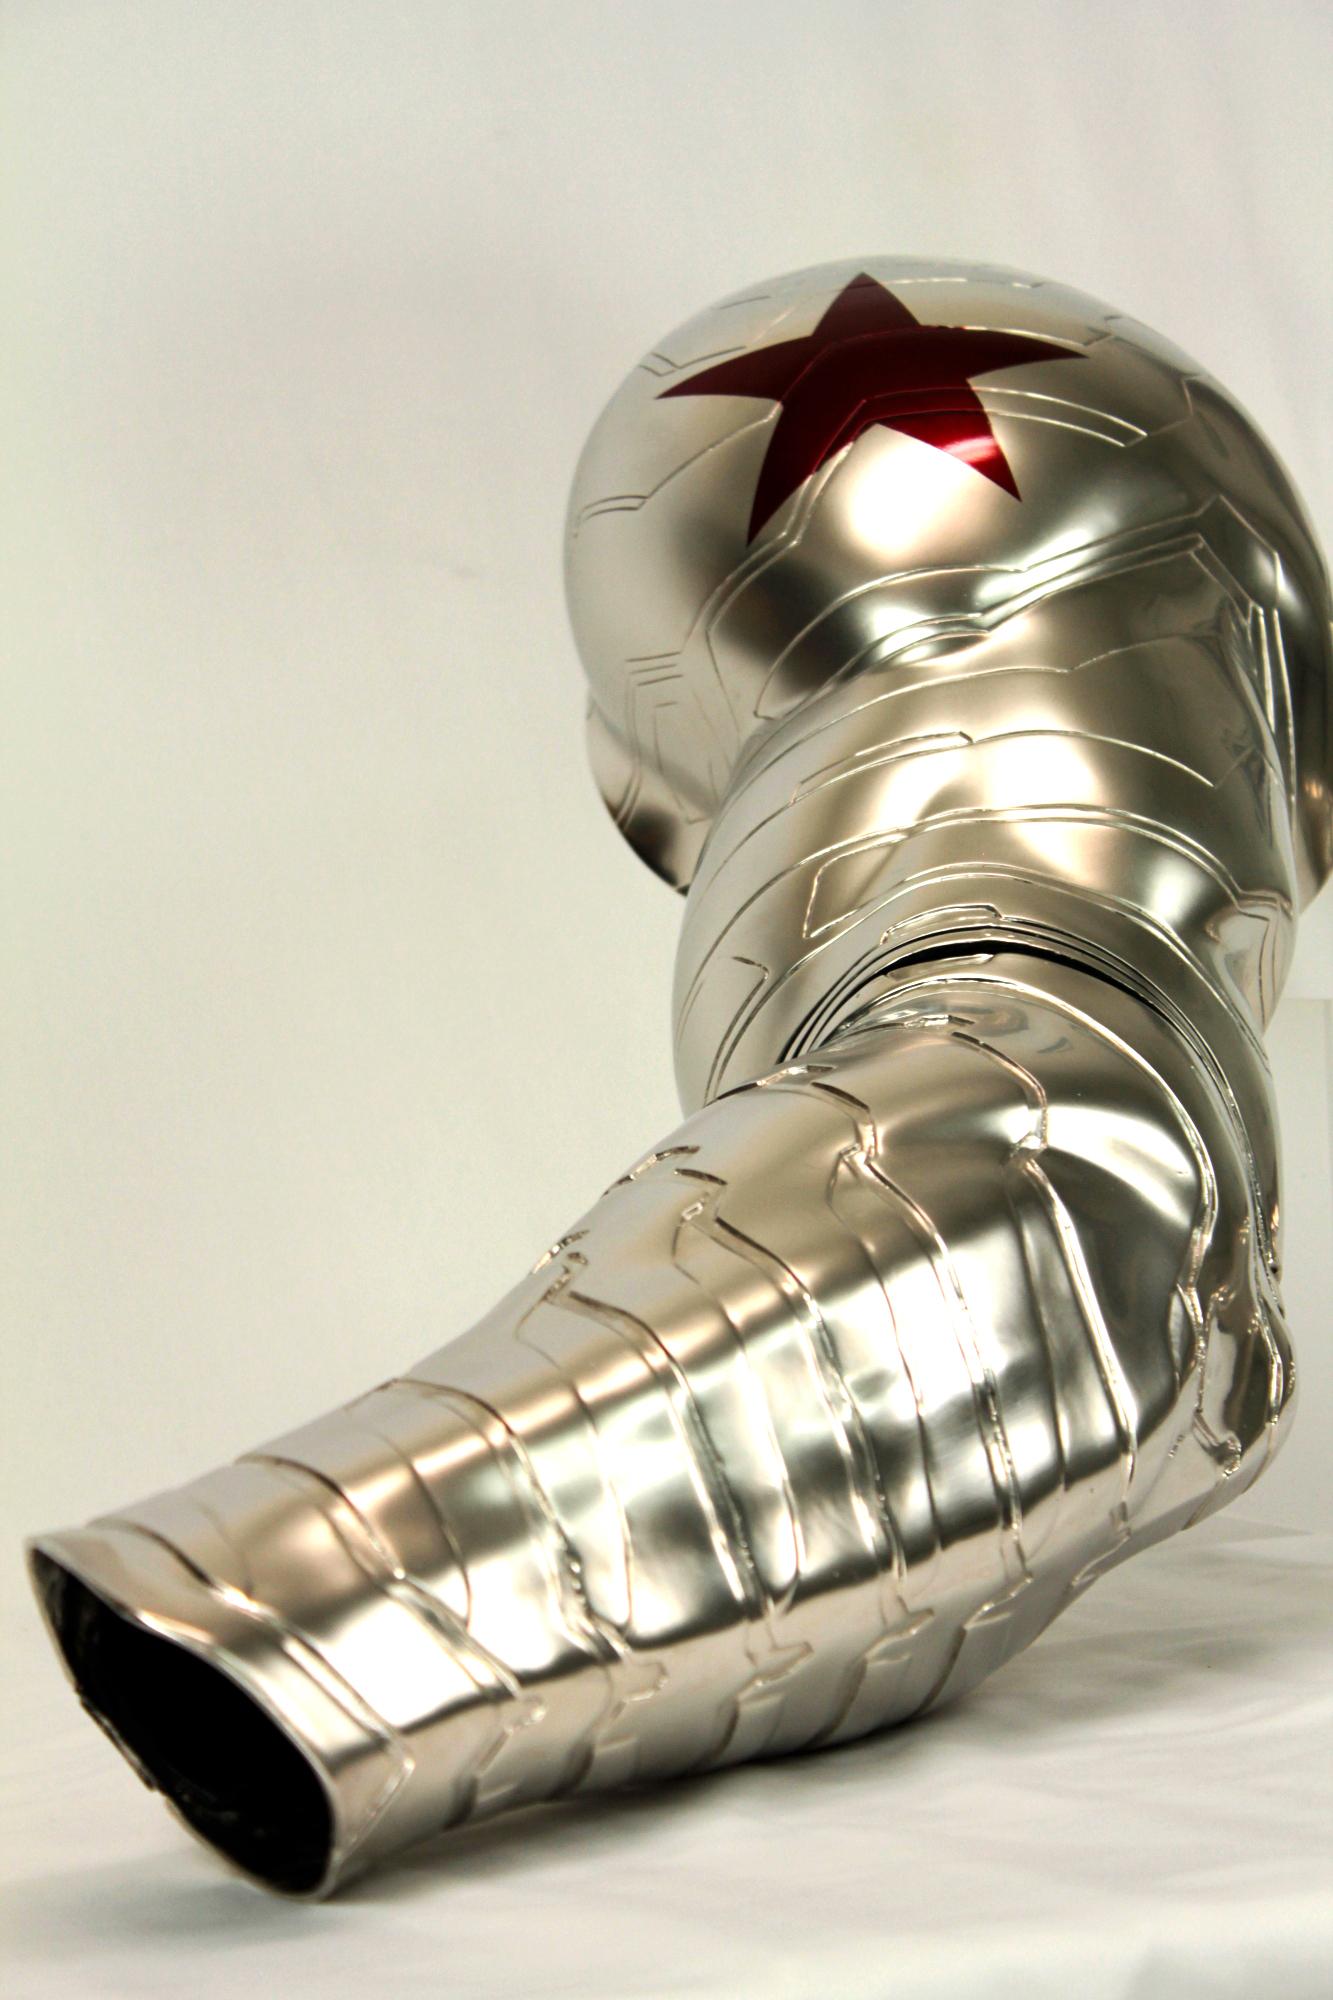 Winter Soldier Arm - SRI (30)